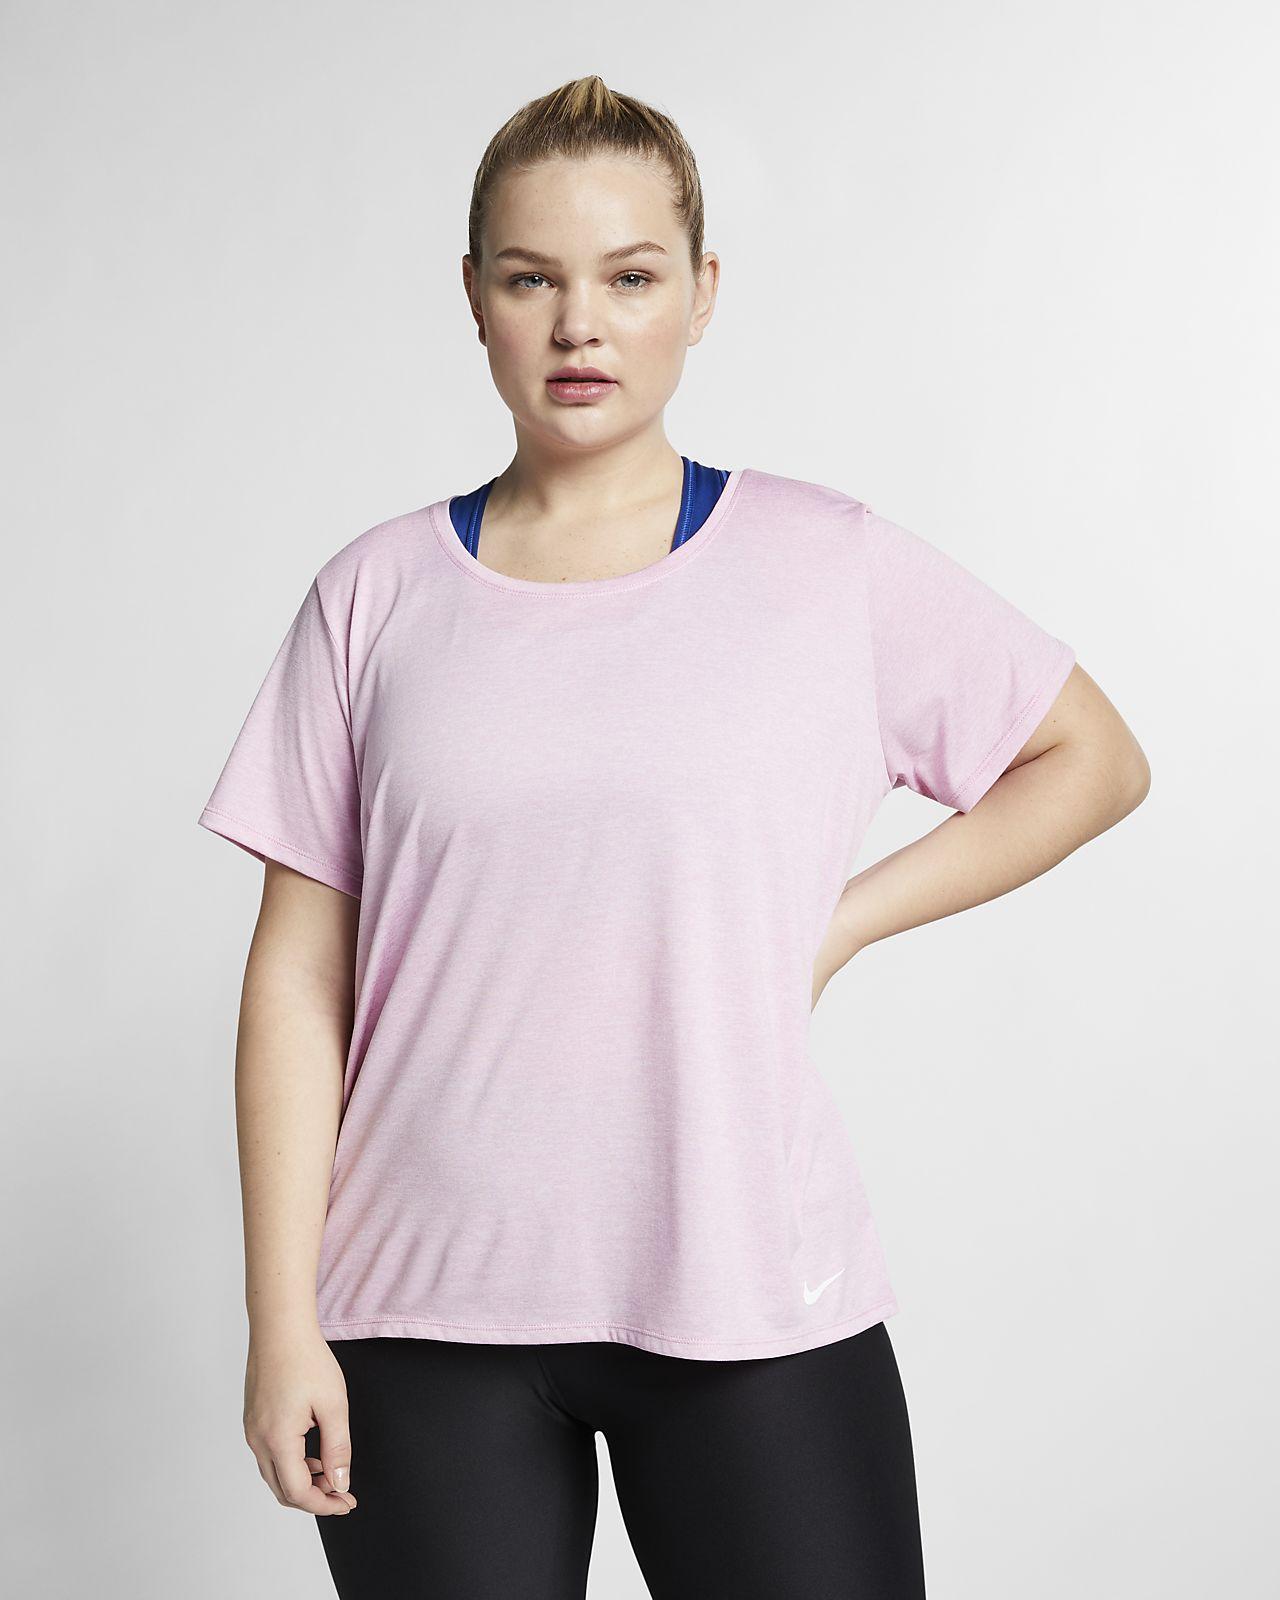 Nike Dri Fit Legend Plus Size Womens Short Sleeve Training Top